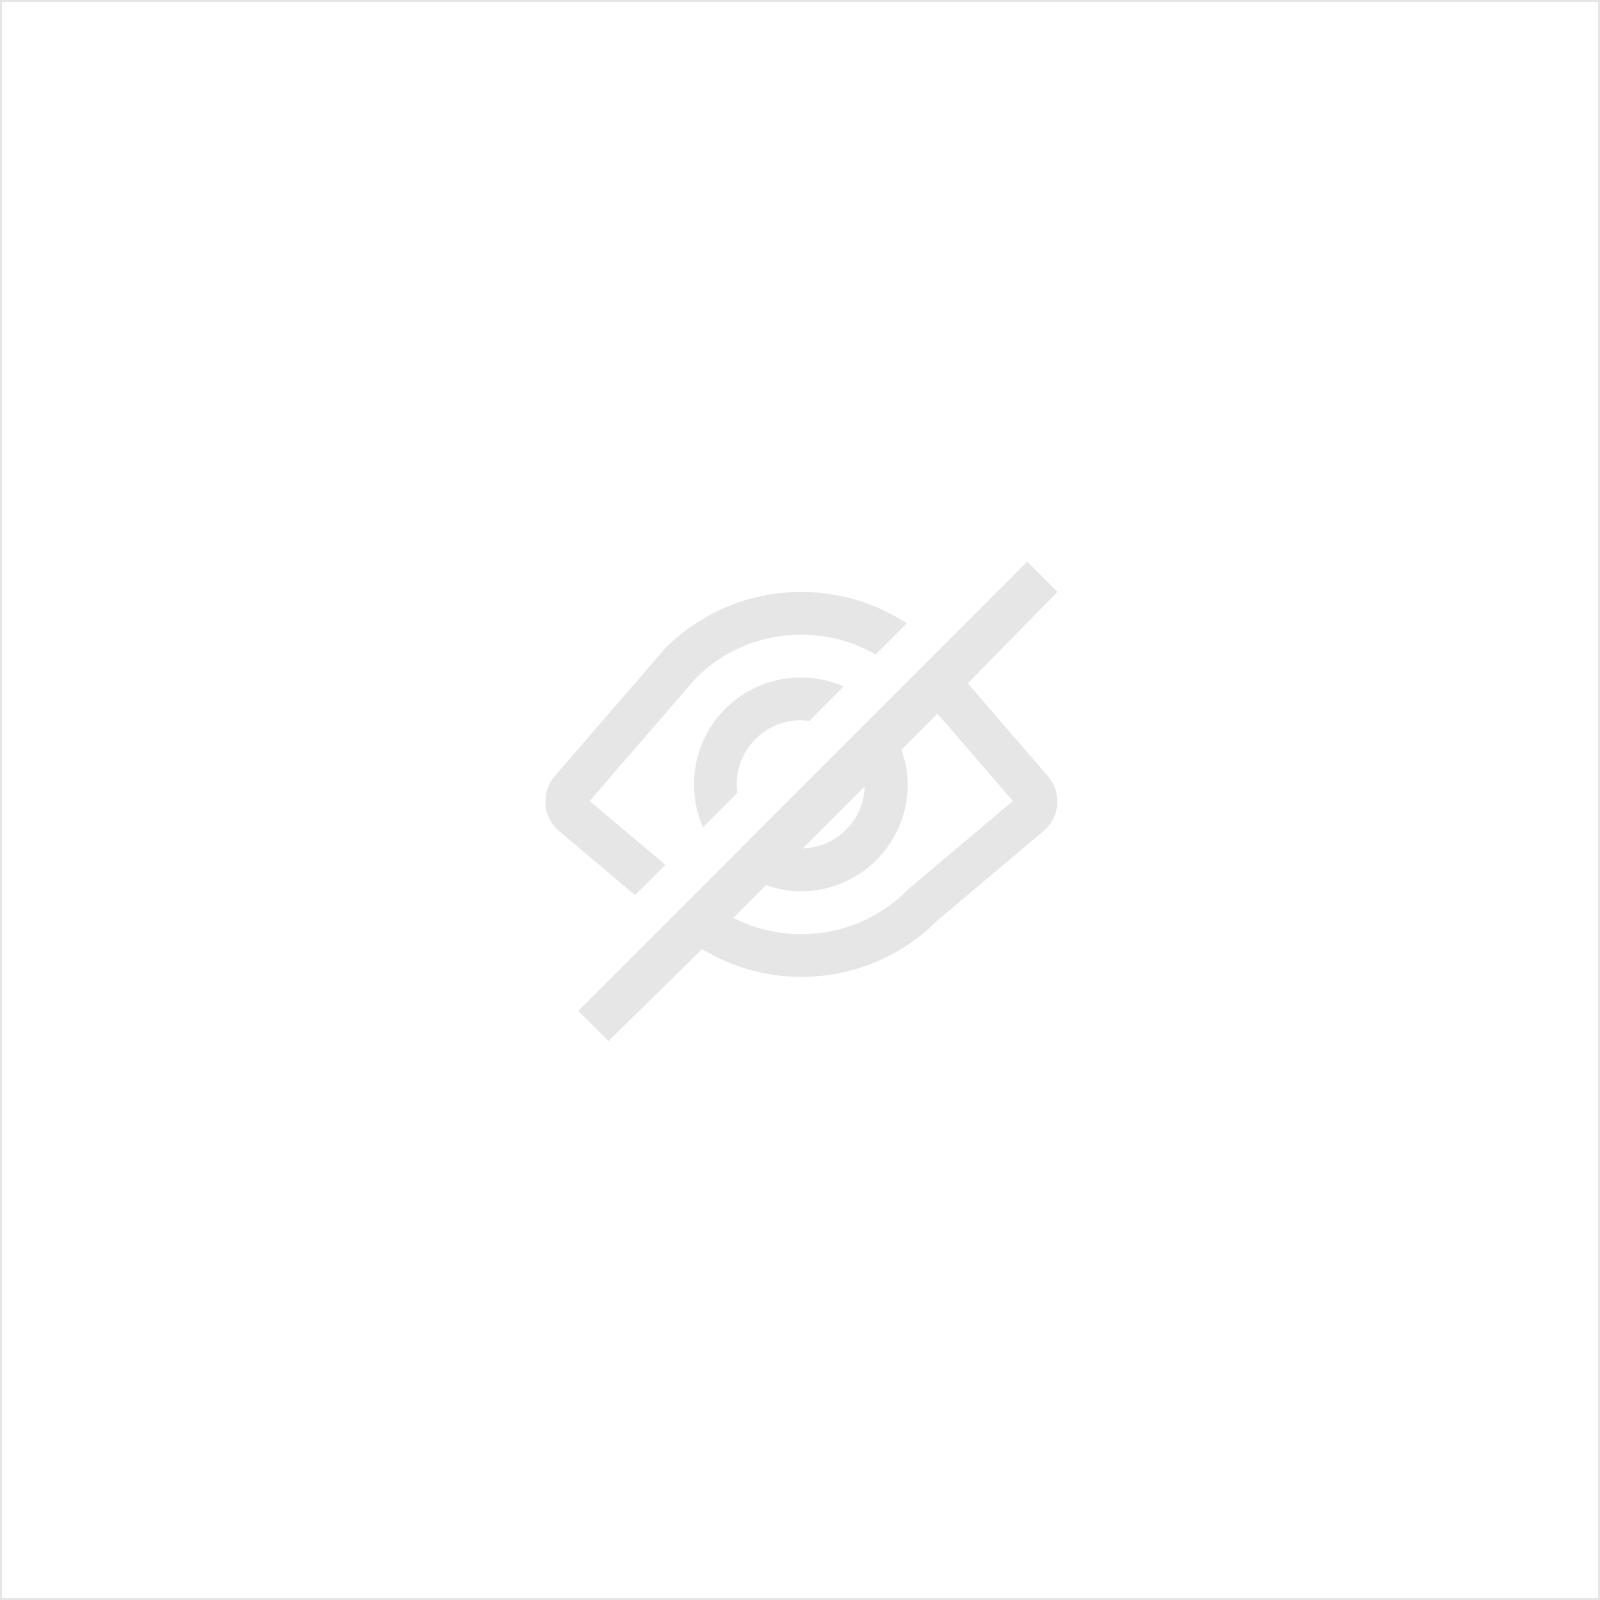 ROESTOMVORMER  0,5L (Convertisseur 5030-0.5L)